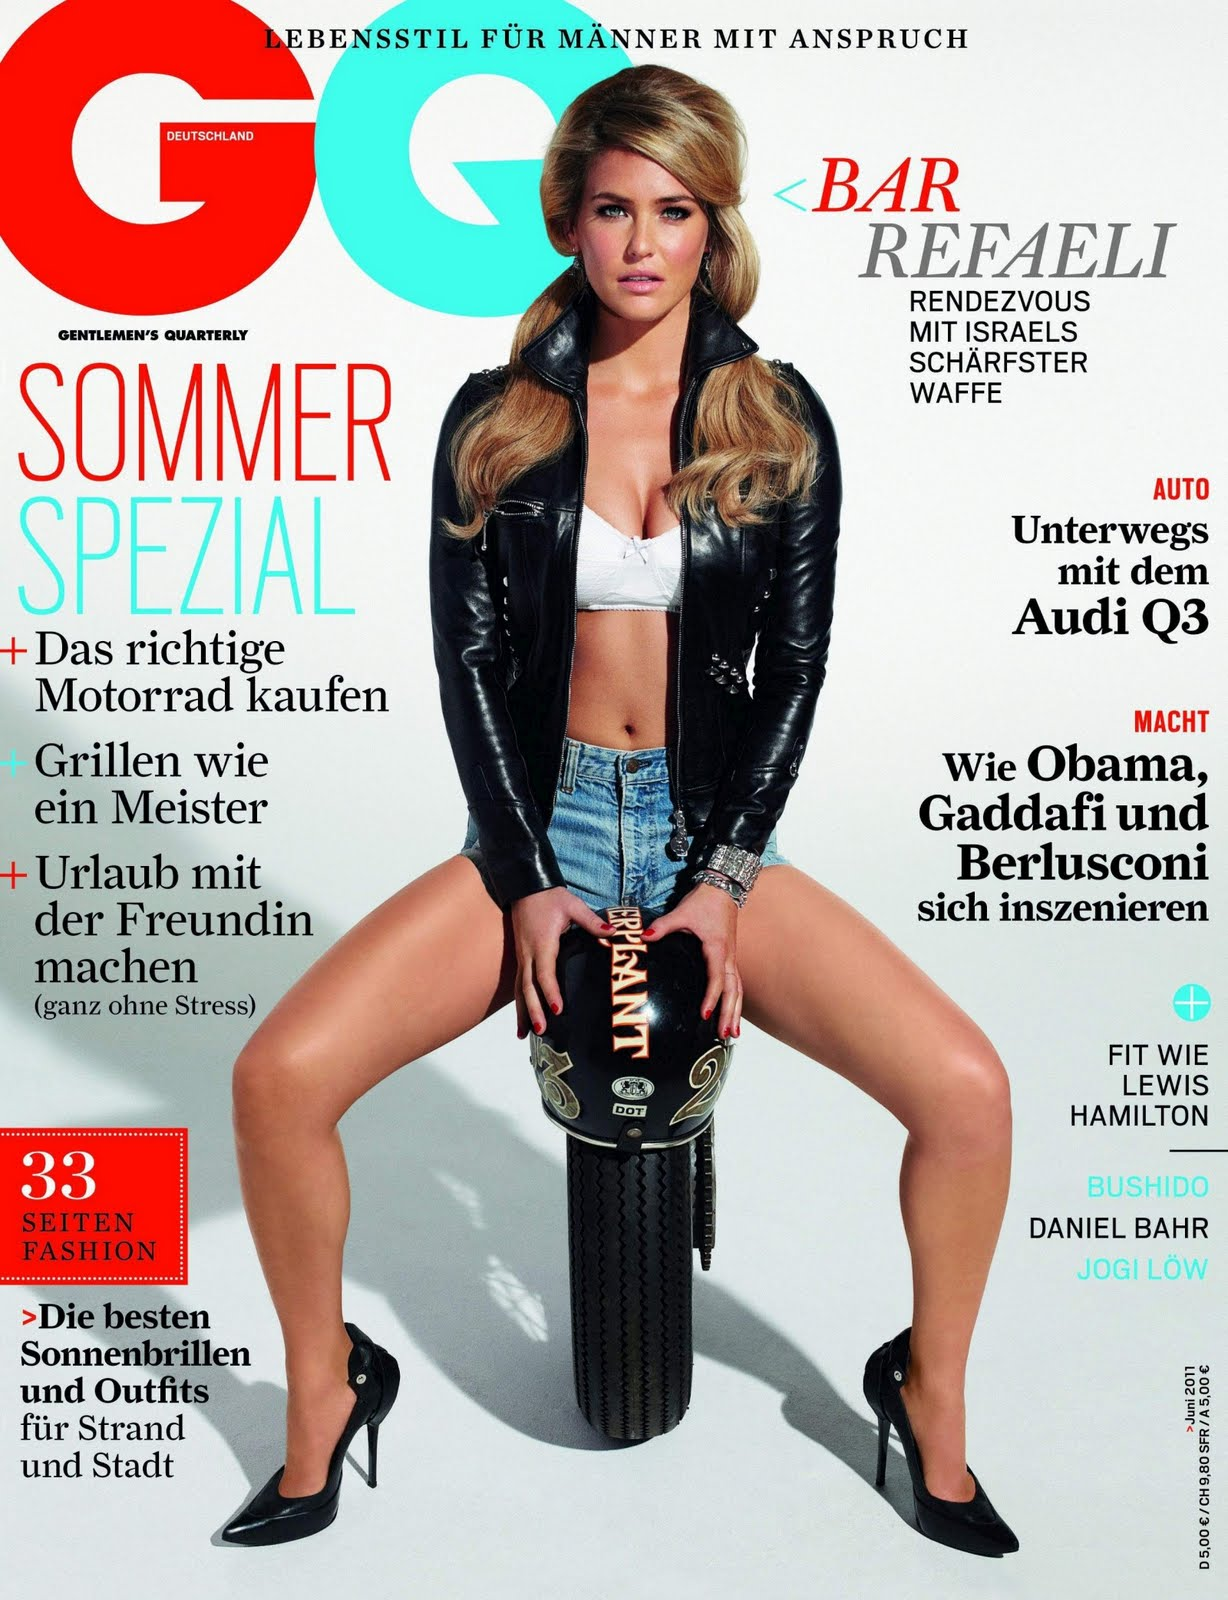 Bar Refaeli (GQ Germany, June 2011) - Models Inspiration